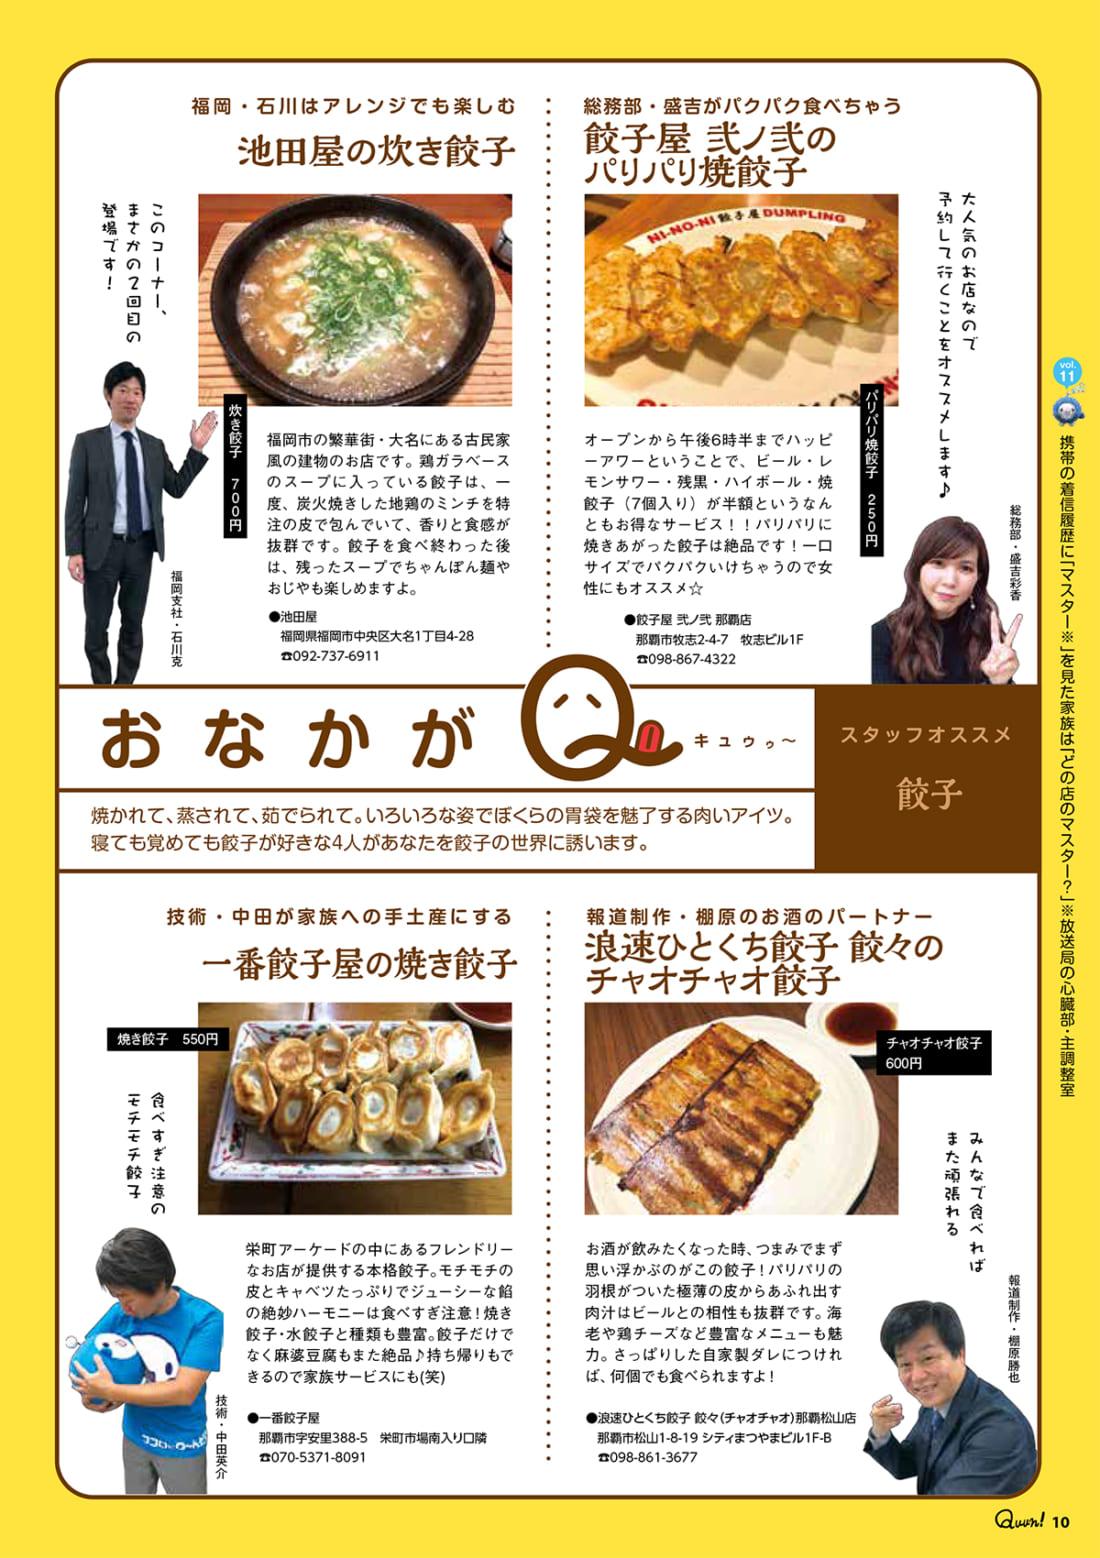 https://www.qab.co.jp/qgoro/wp-content/uploads/quun_1112-1100x1558.jpg